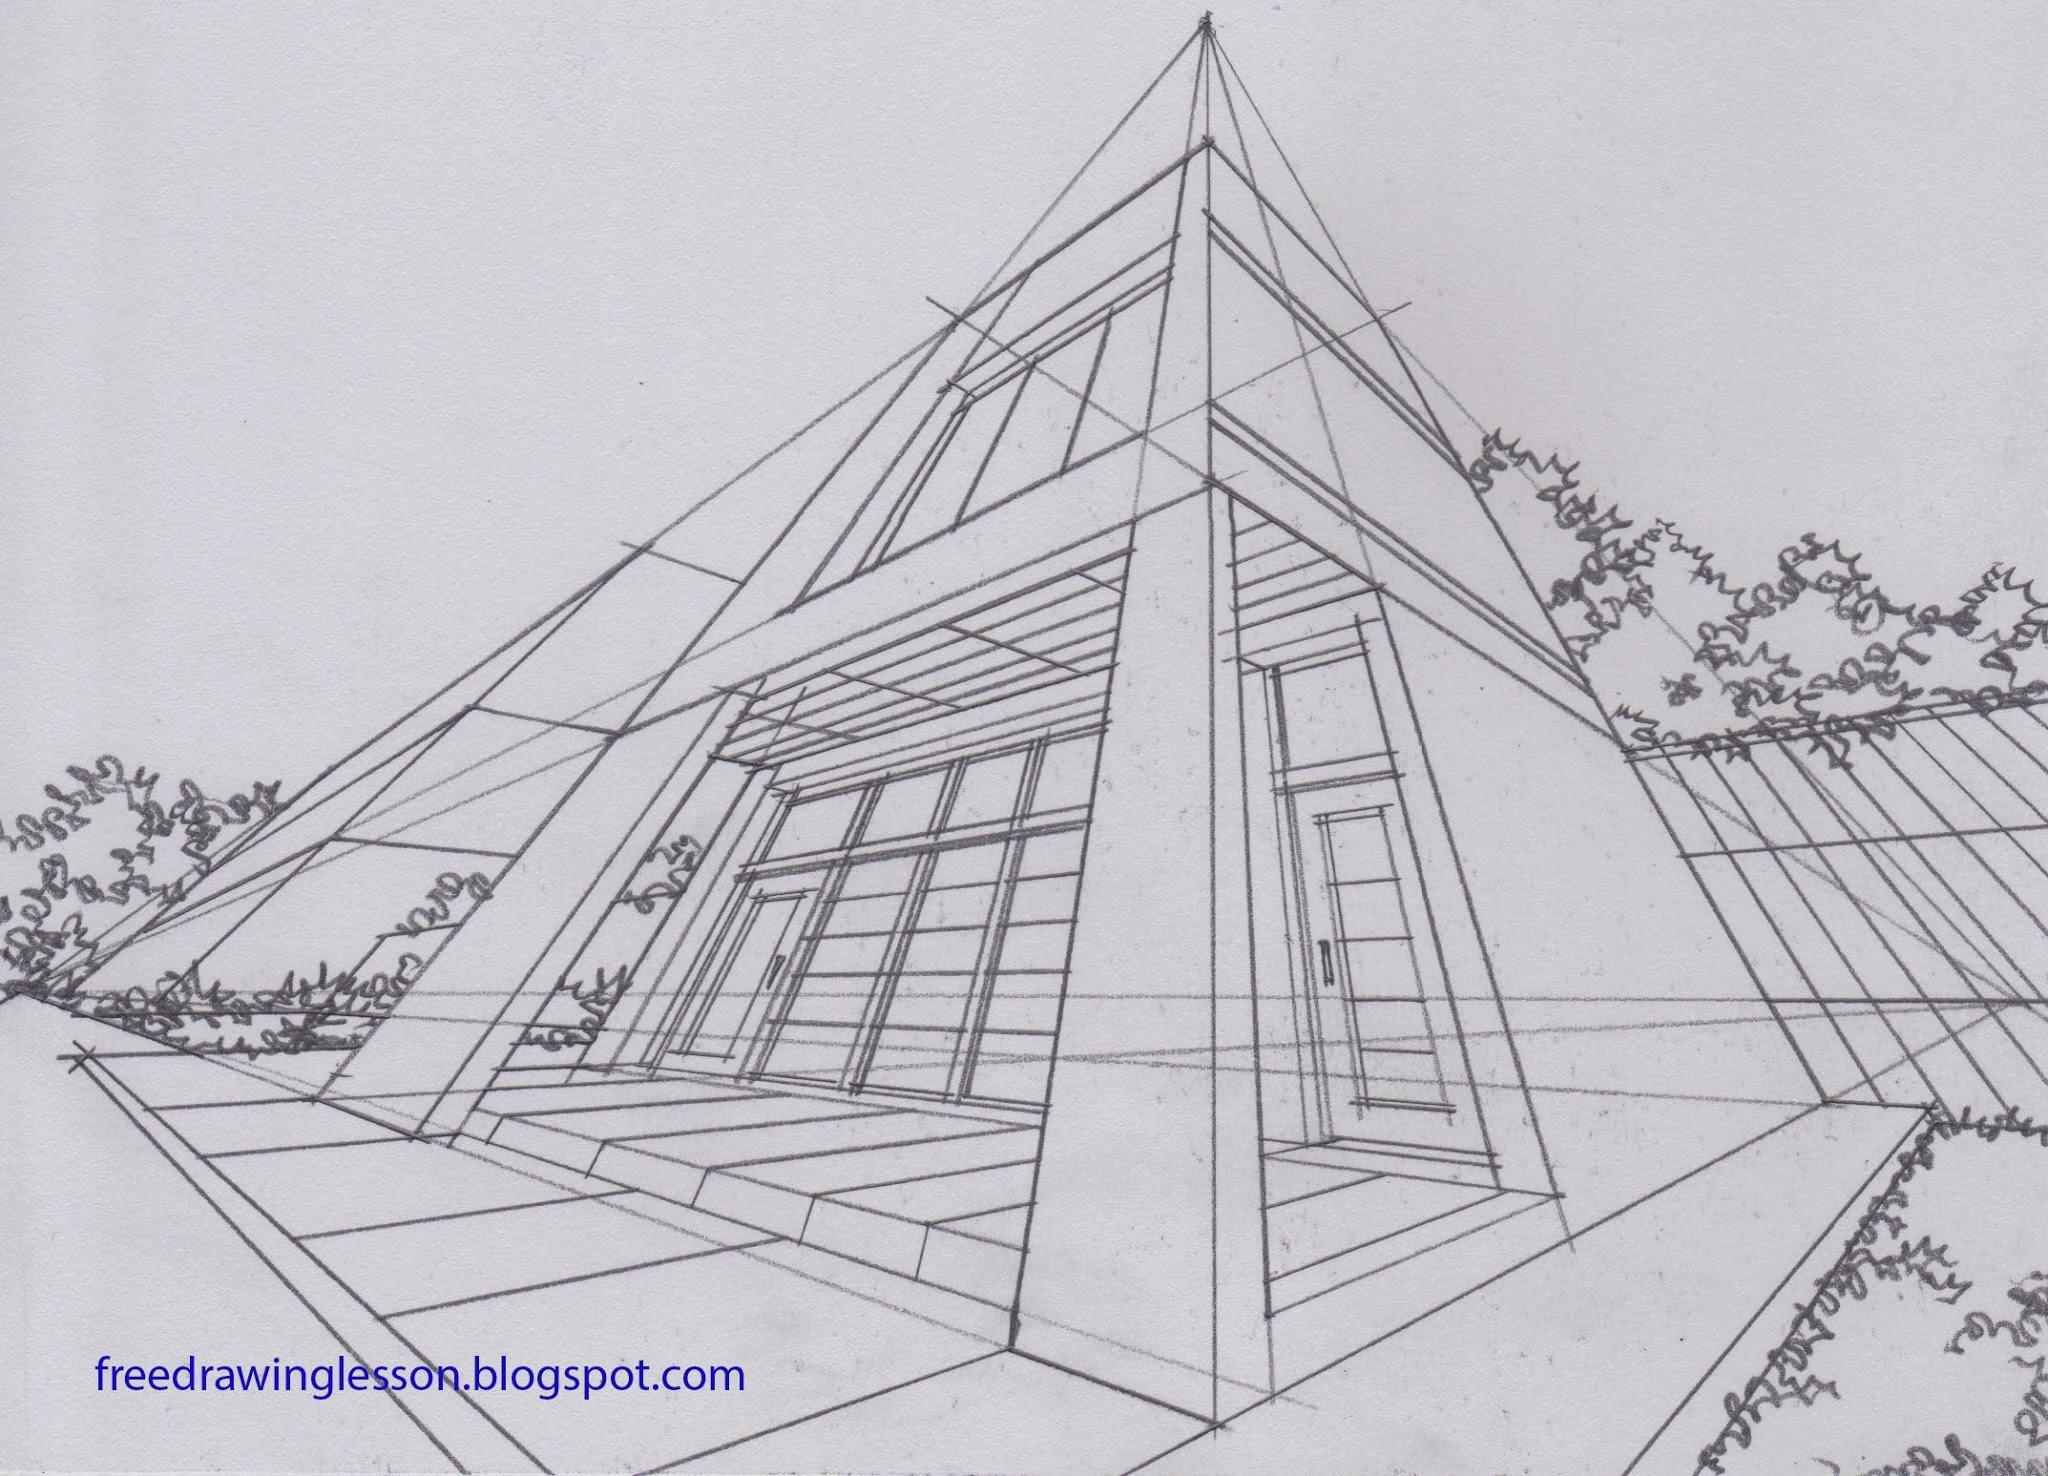 Drawn pyramid three On Pinterest point Three 25+